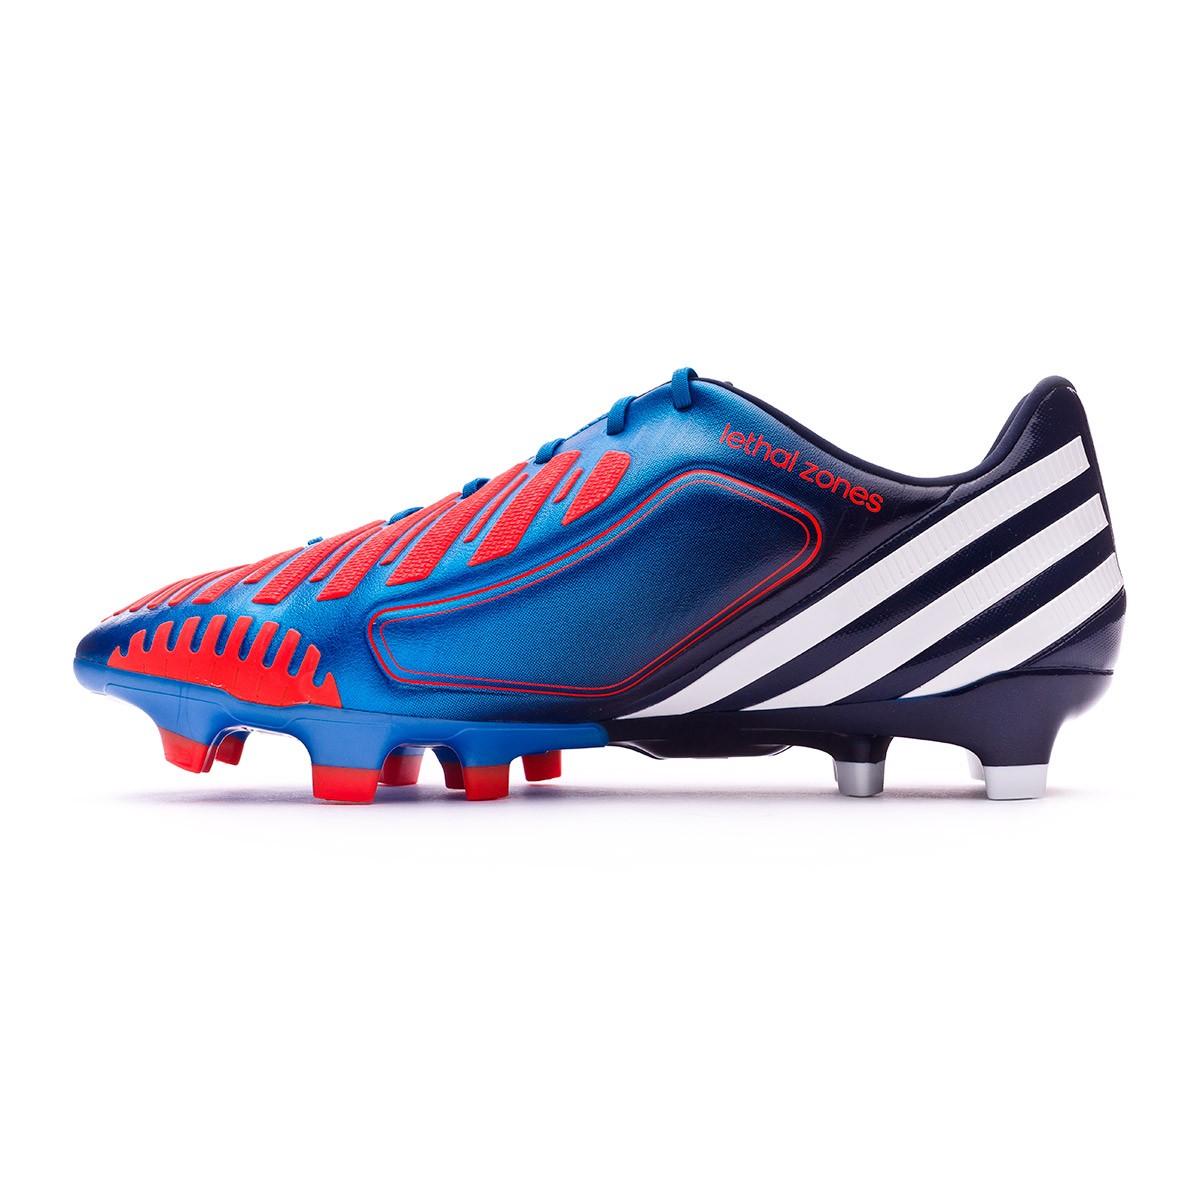 quality design 8bf18 96bdd Zapatos de fútbol adidas Predator LZ TRX FG Azul-Blanco-Infrarrojo -  Soloporteros es ahora Fútbol Emotion